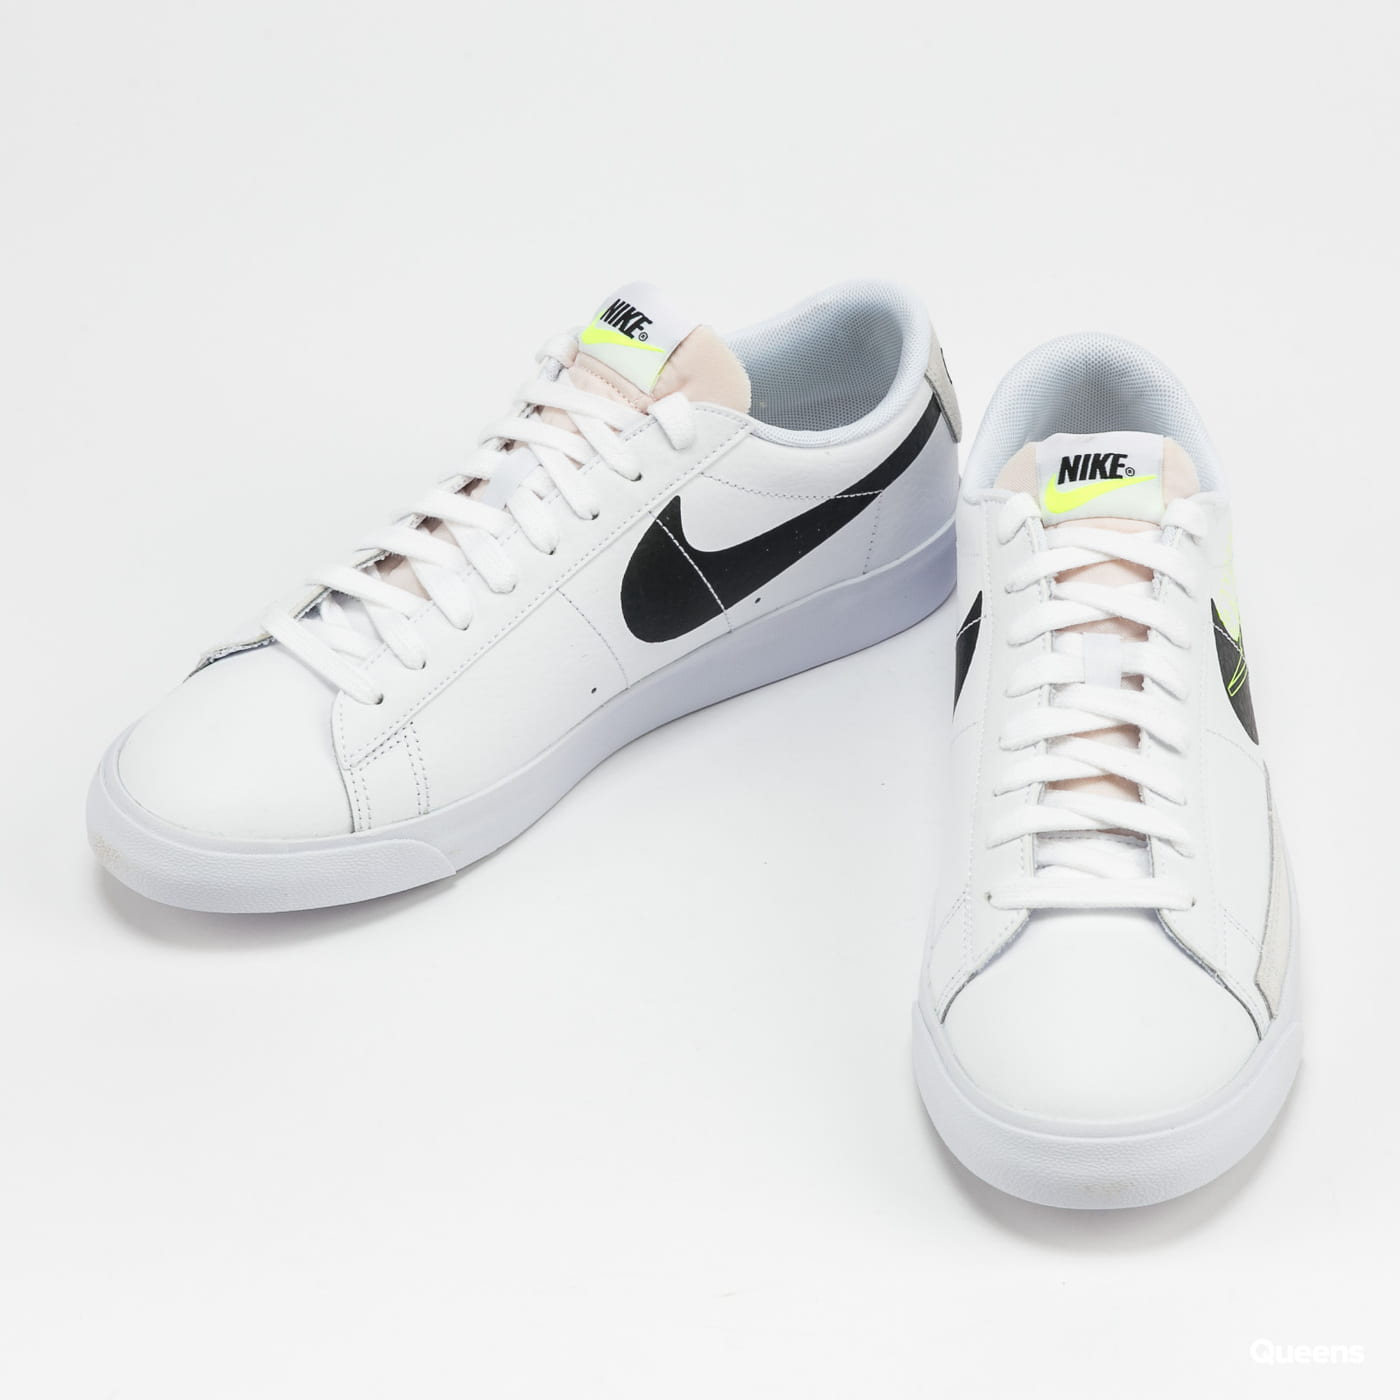 Nike Blazer Low white / black - volt - summit white